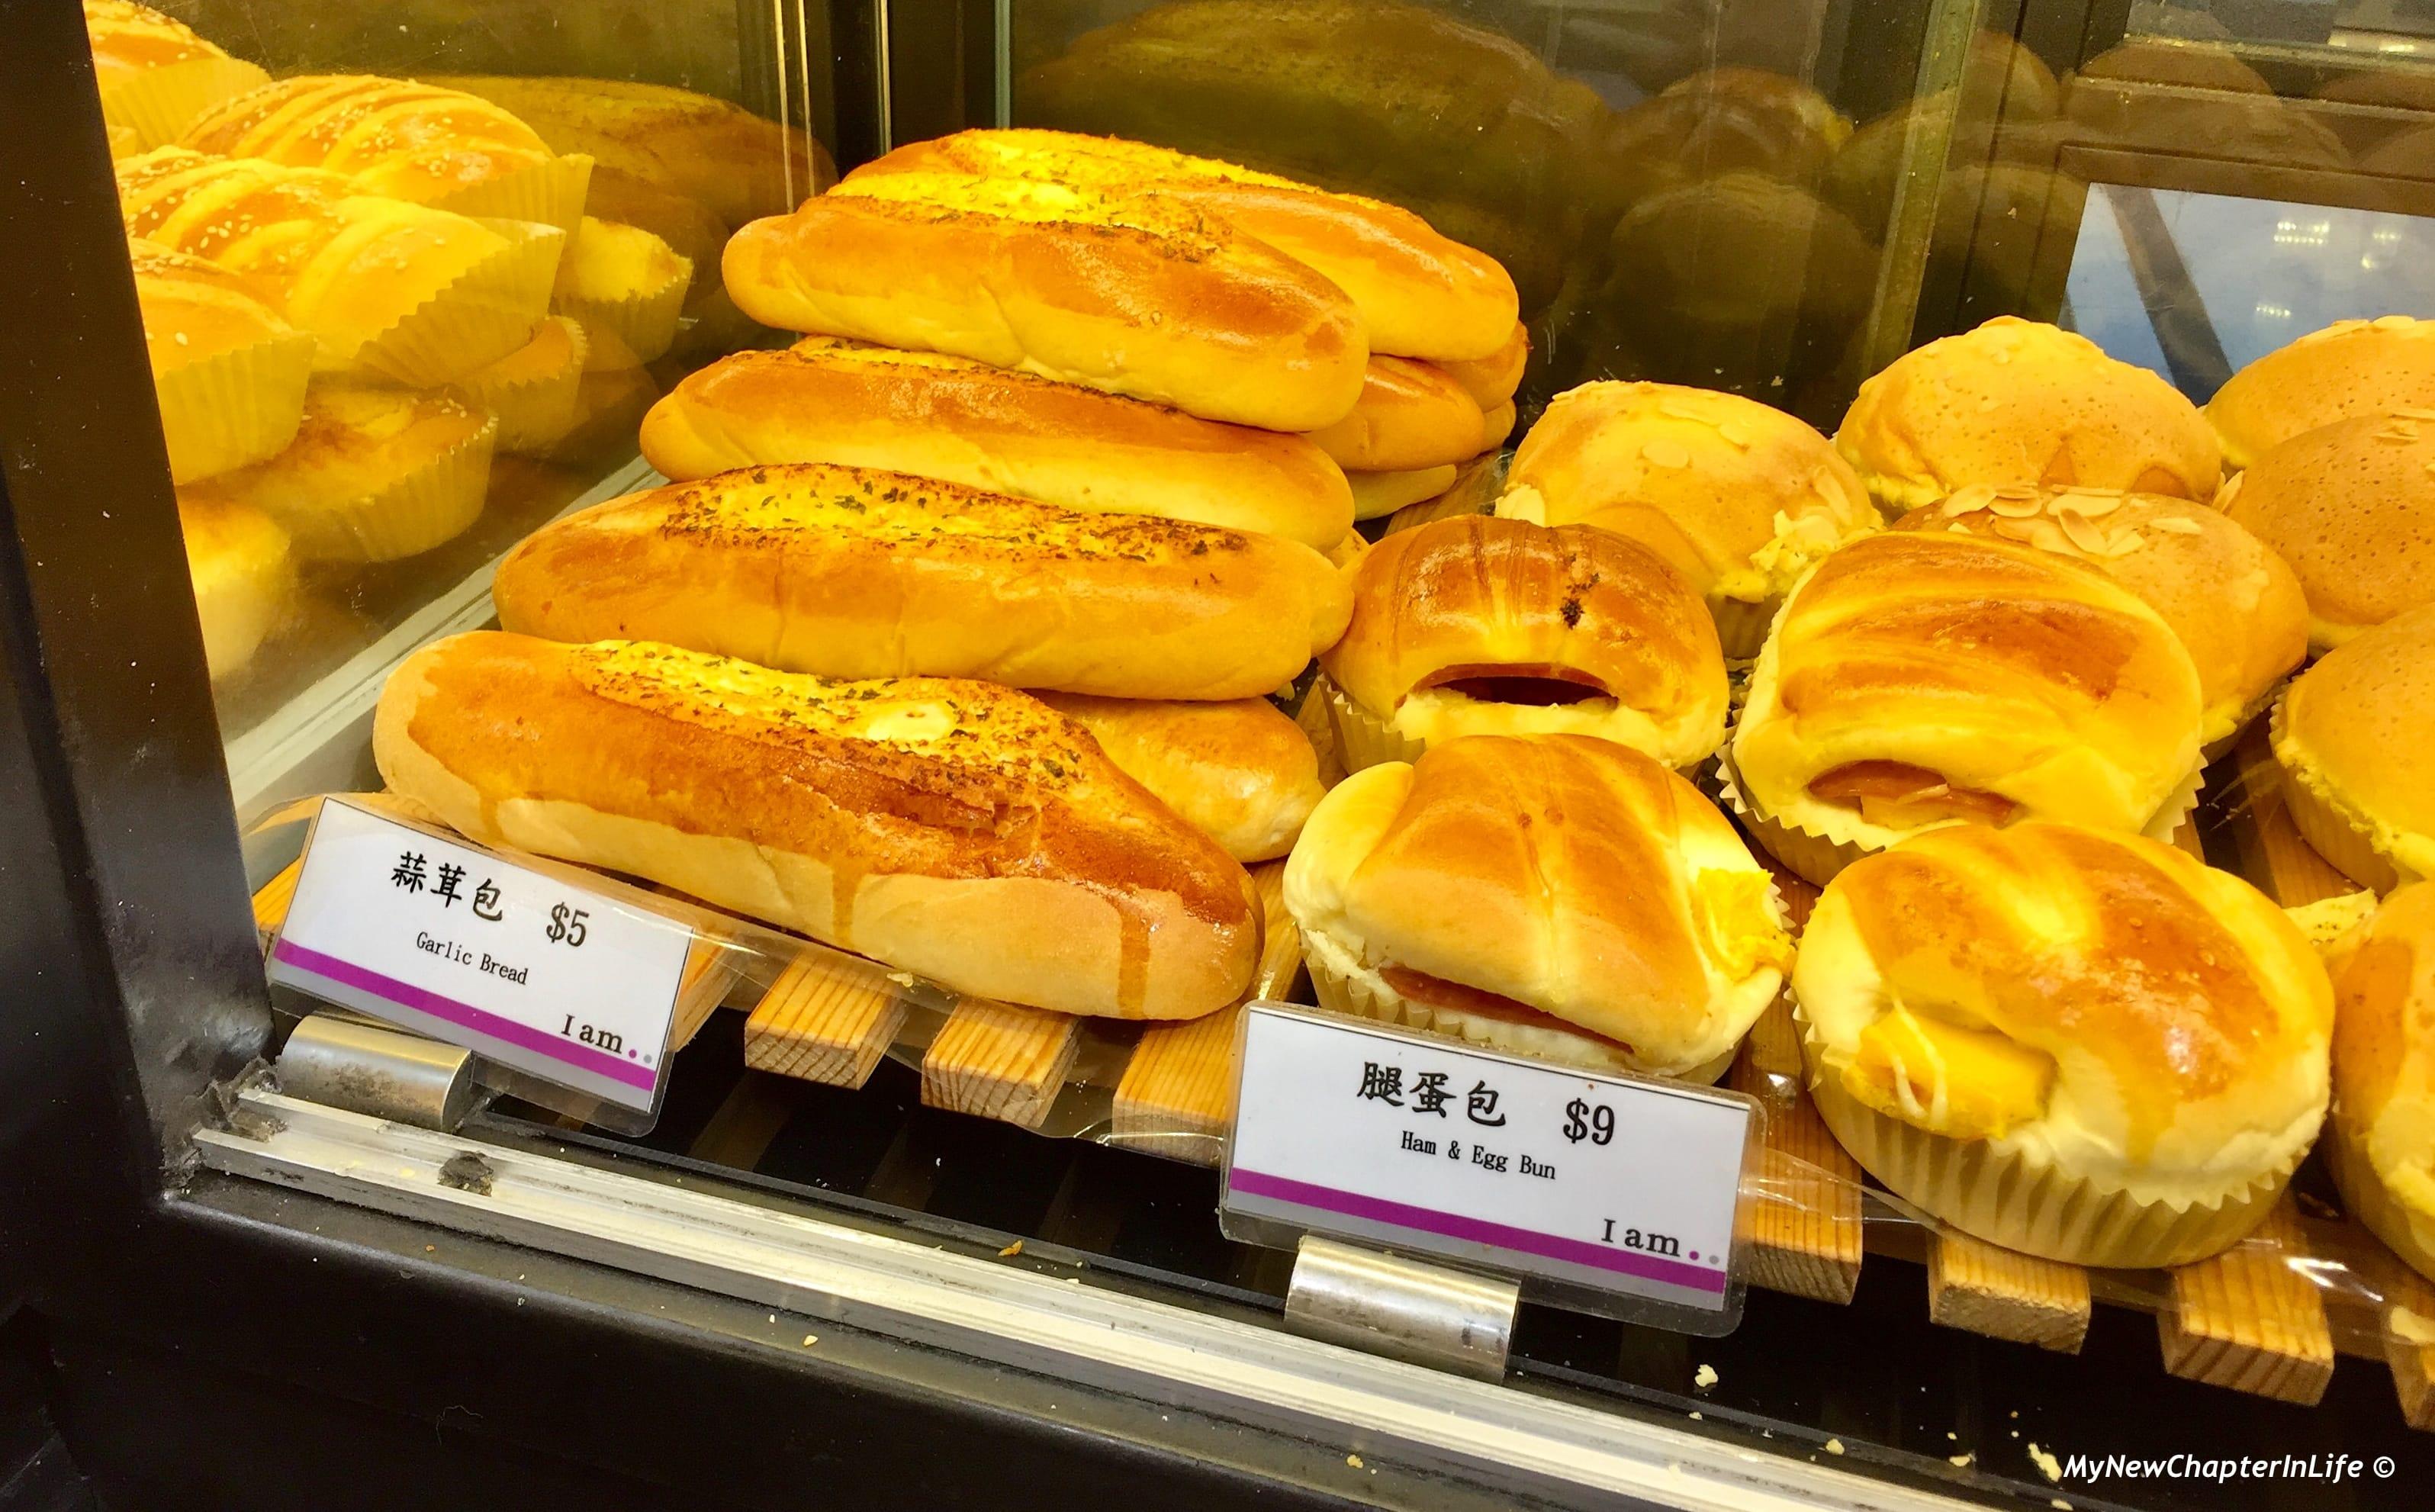 蒜茸包、火腿疍包 Garlic Bread, Ham and Egg Bun